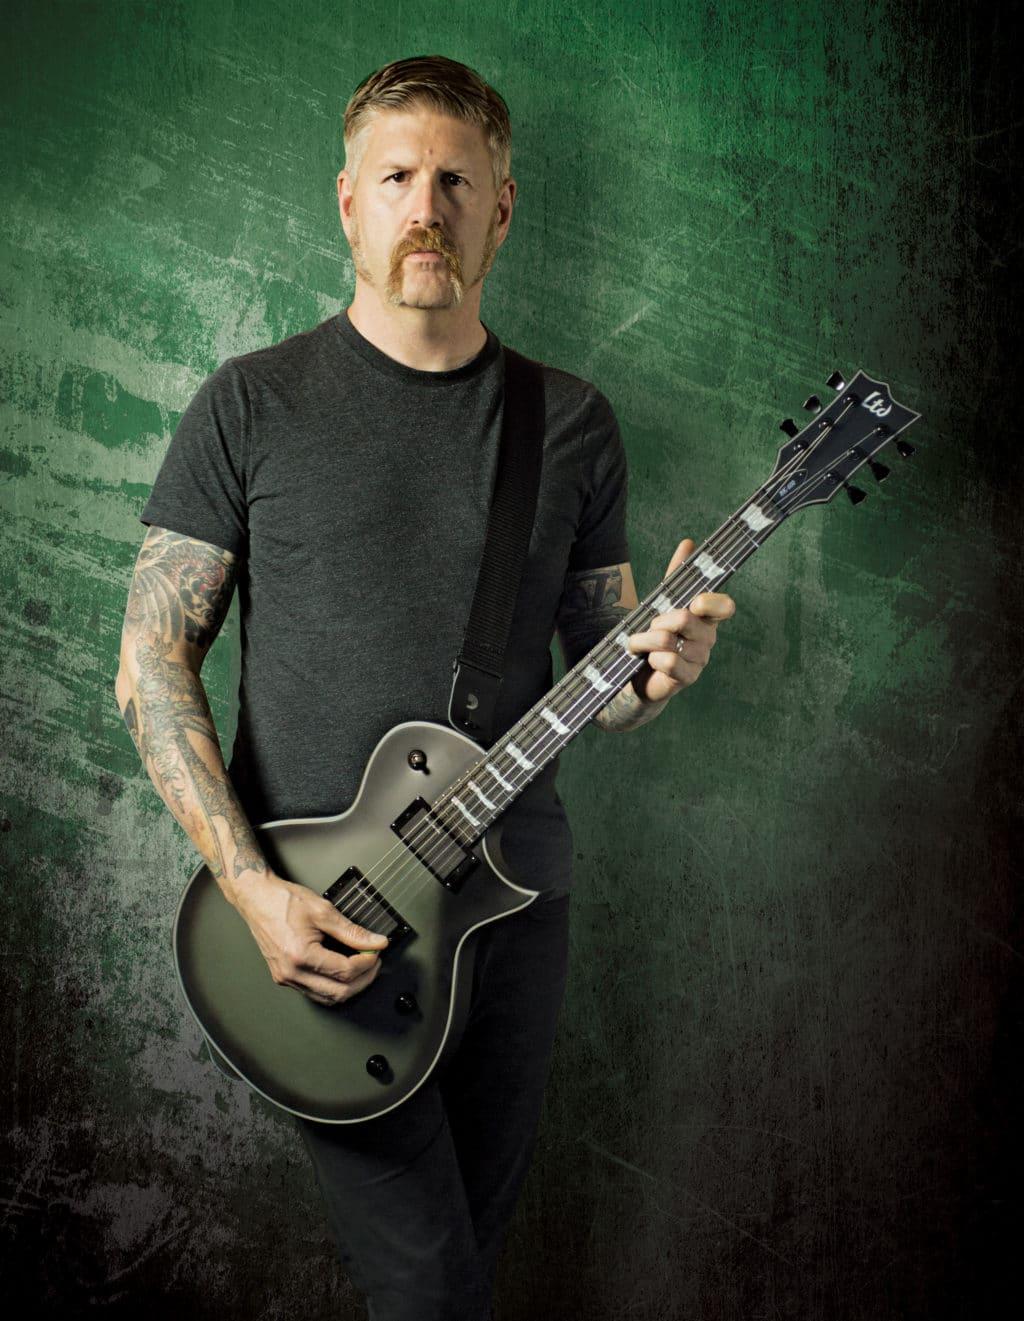 MAstoodon Gitarrist mit ESP GItarre